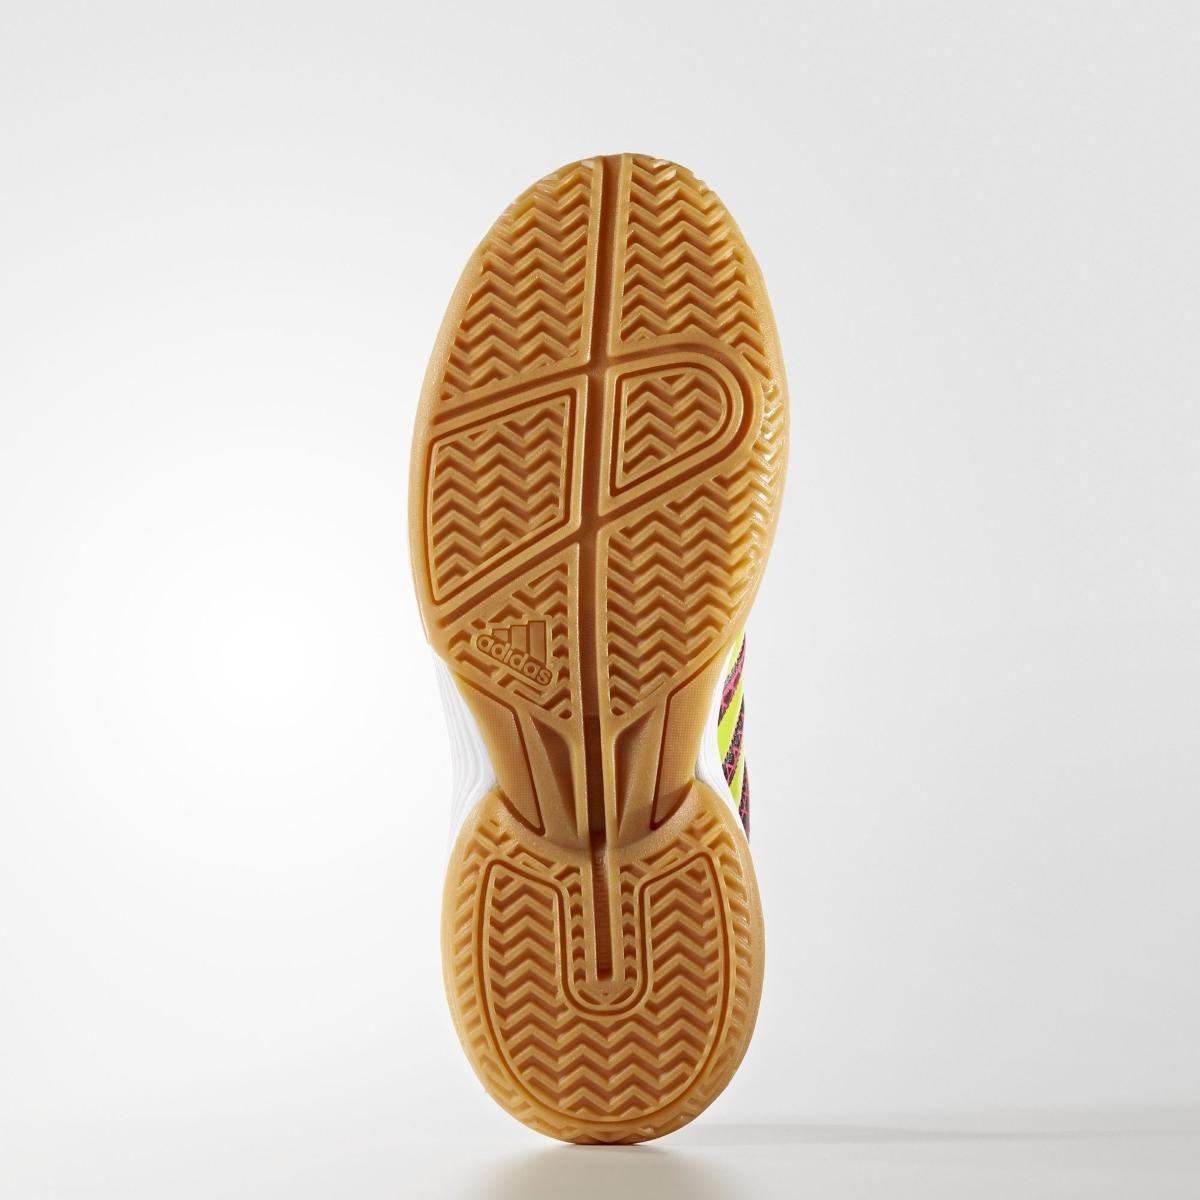 fb0935285b8b5 tênis vôlei adidas ligra 4 tecnologia adiwear® original. Carregando zoom.